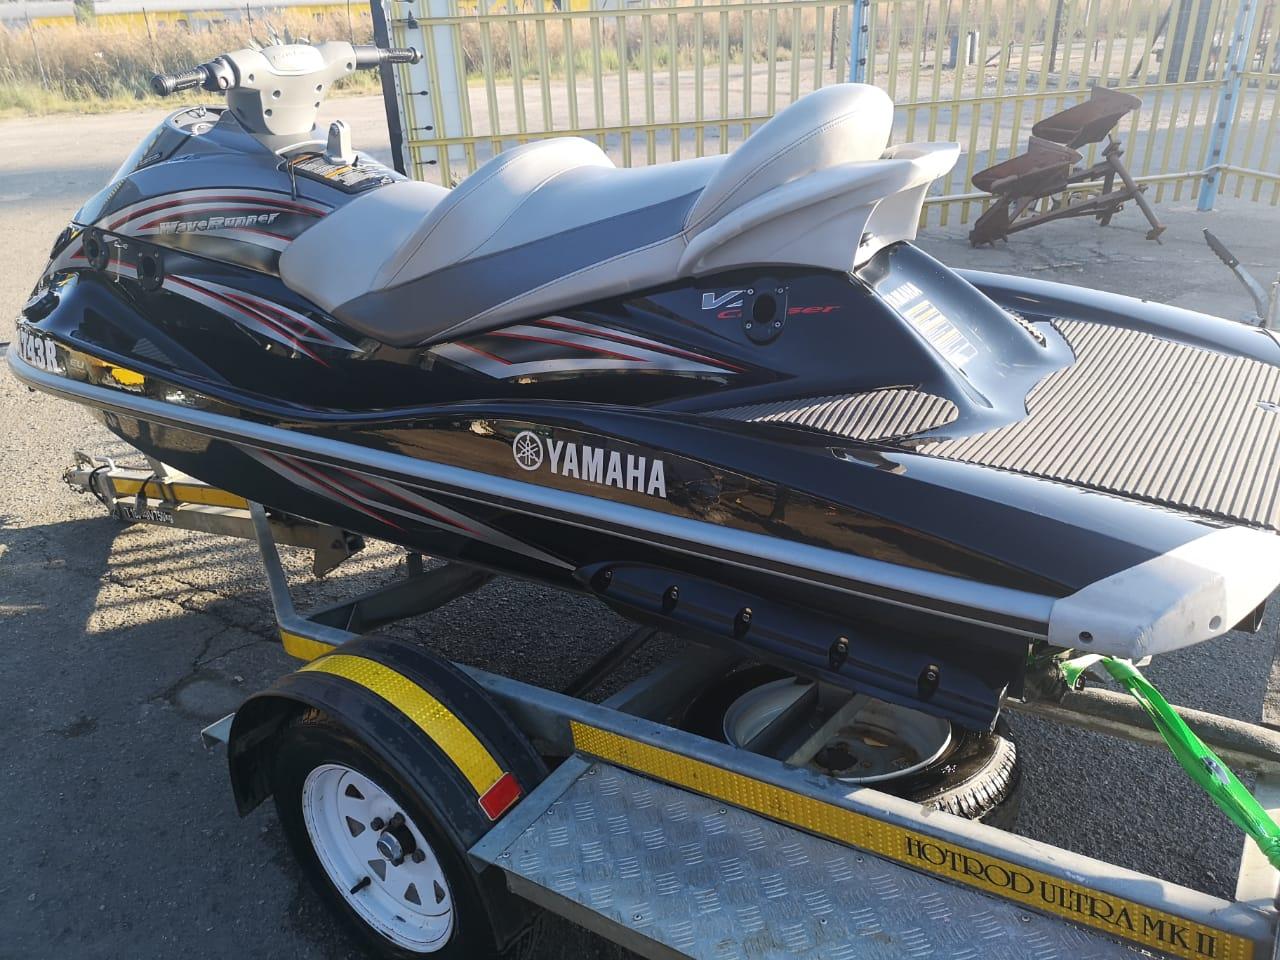 2007 Yamaha VX1100 Waverunner